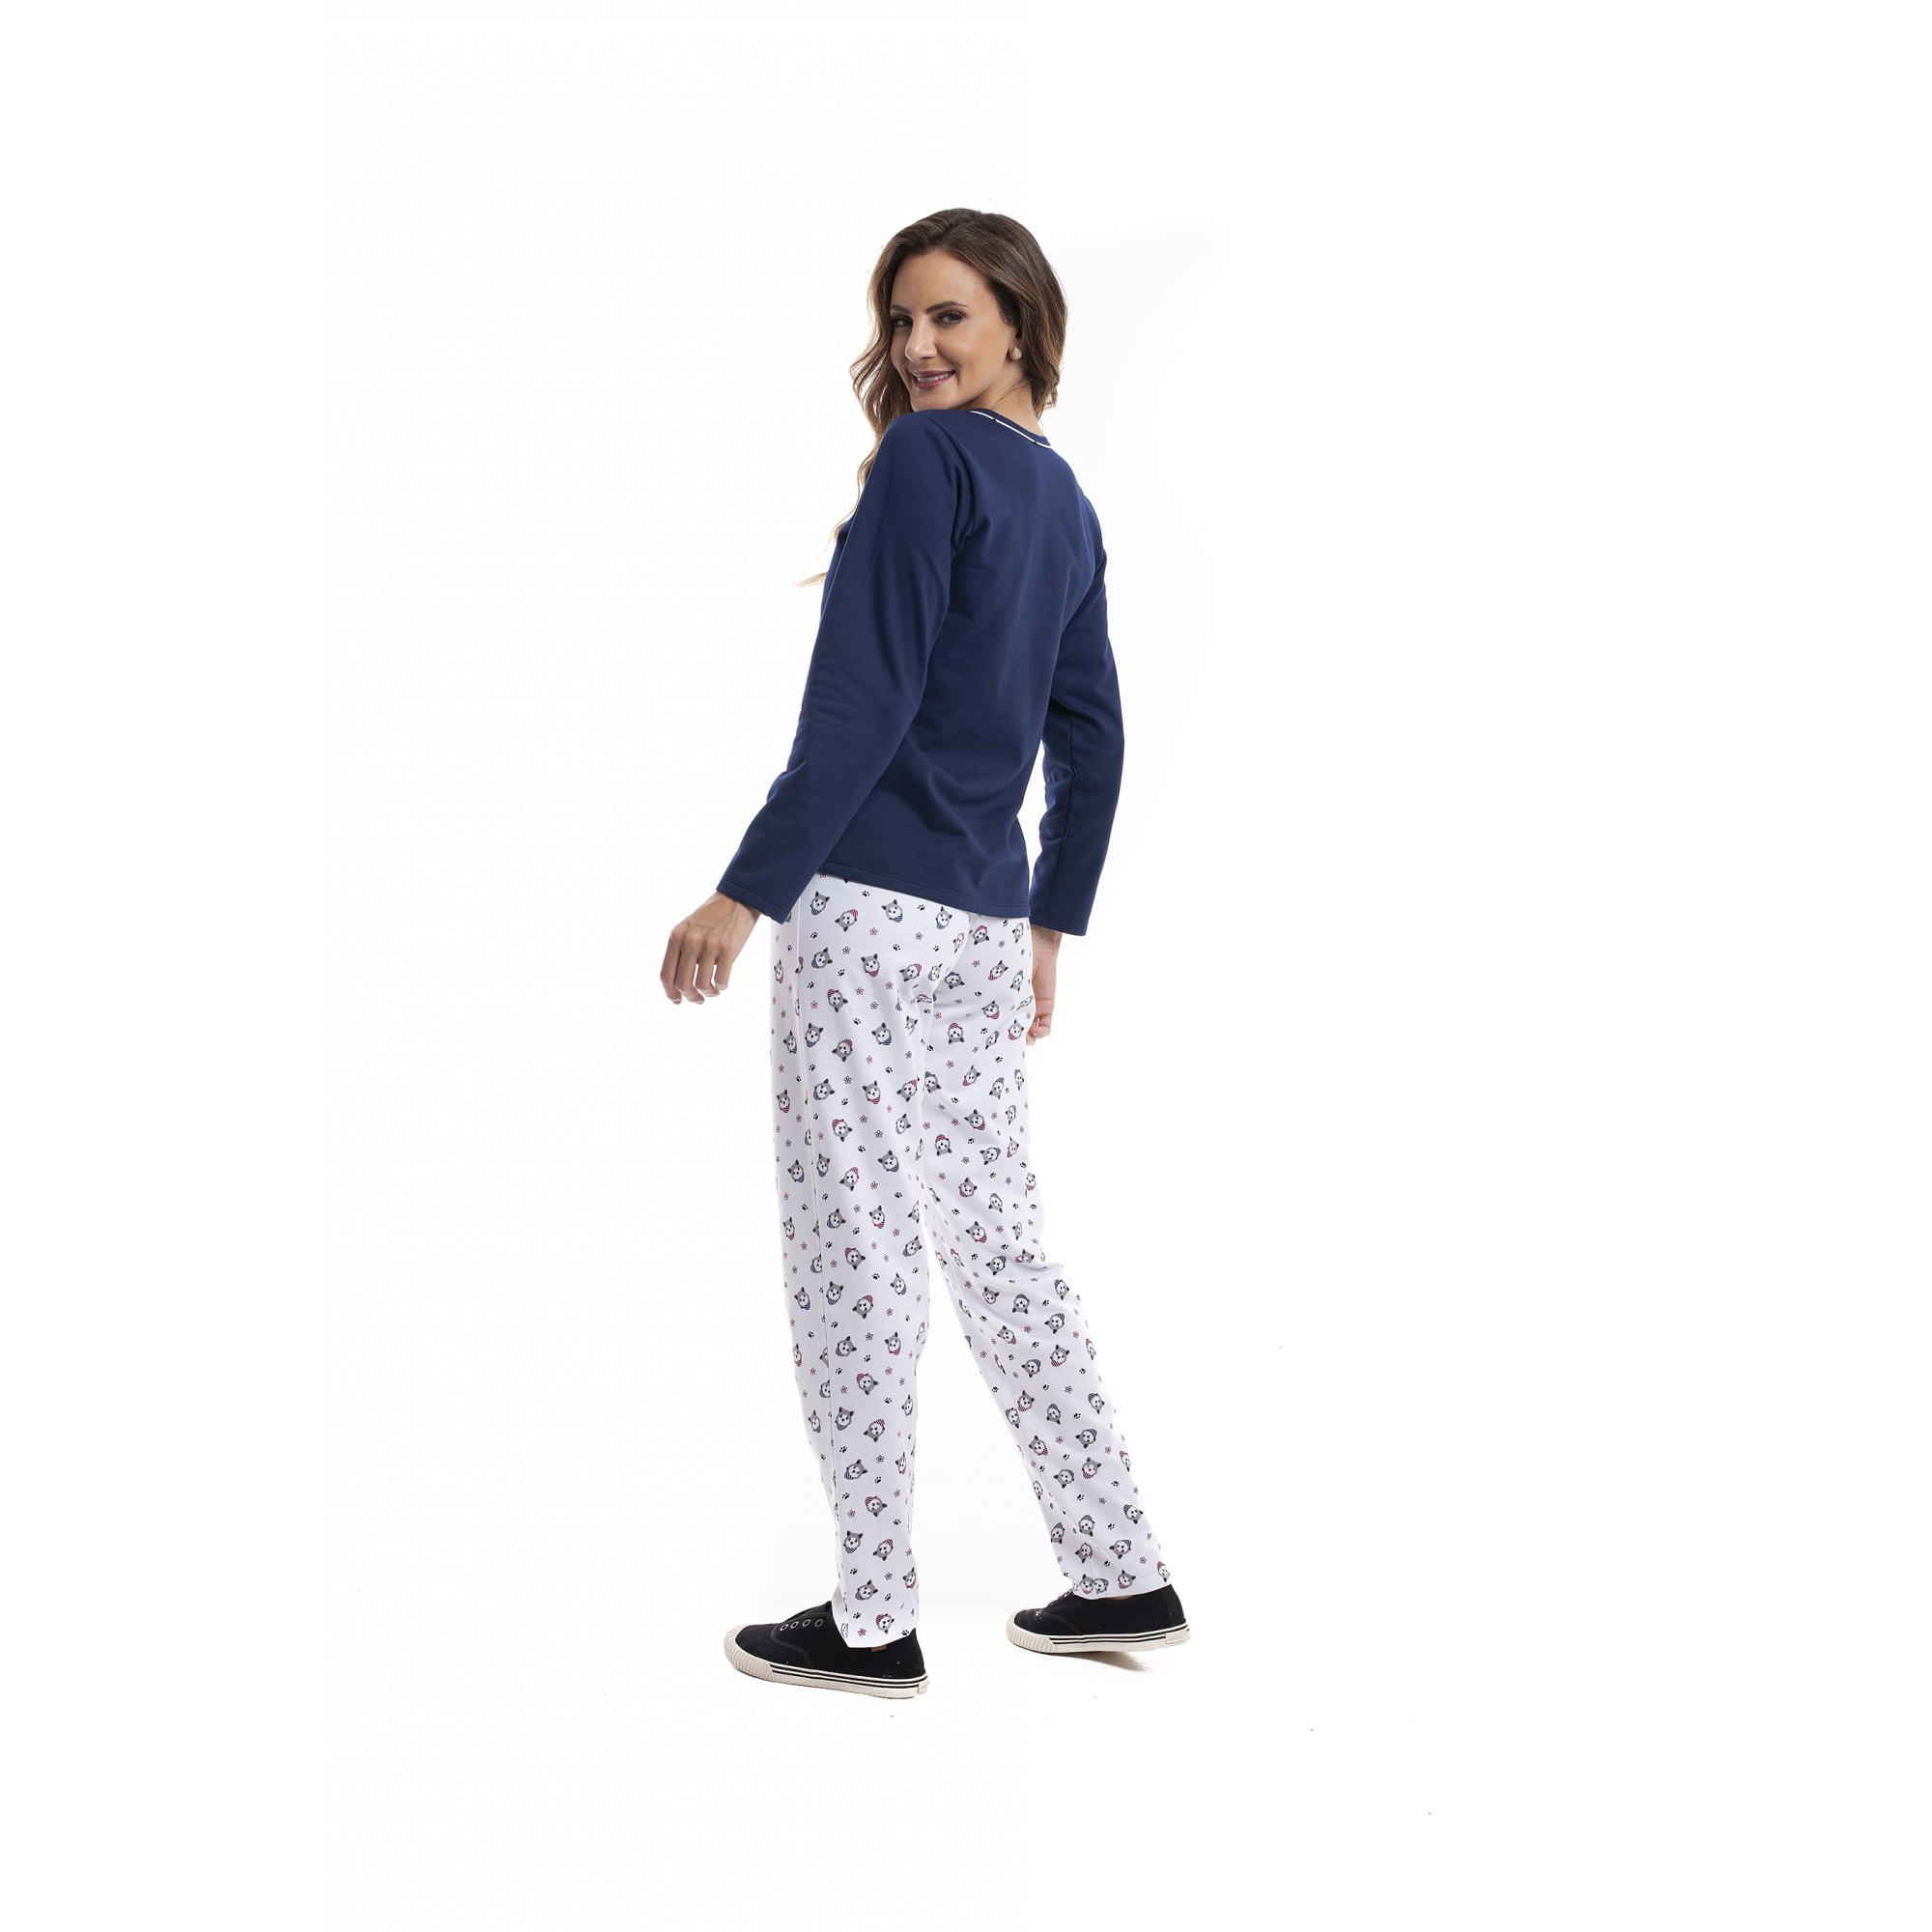 Pijama Feminino Adulo Longo Flanelado Marinho com Estampa Husky 23265